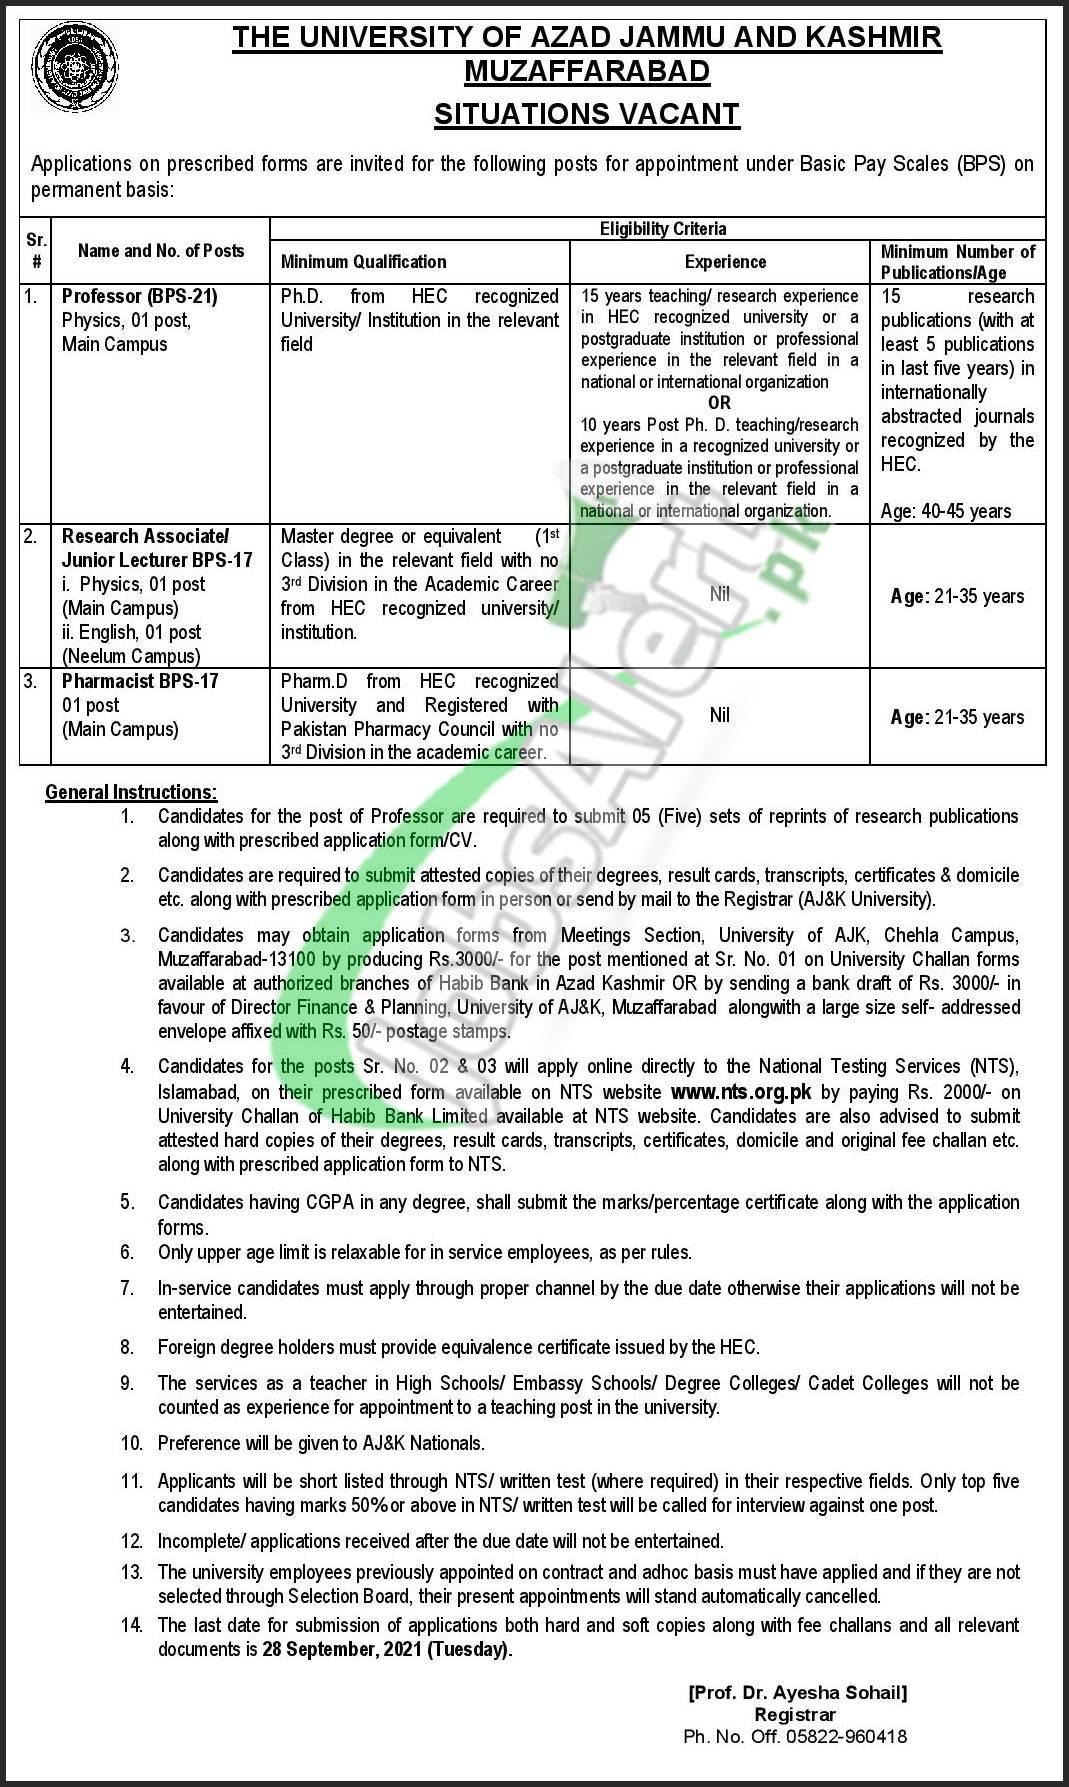 The University of Azad Jammu & Kashmir Muzaffarabad Jobs